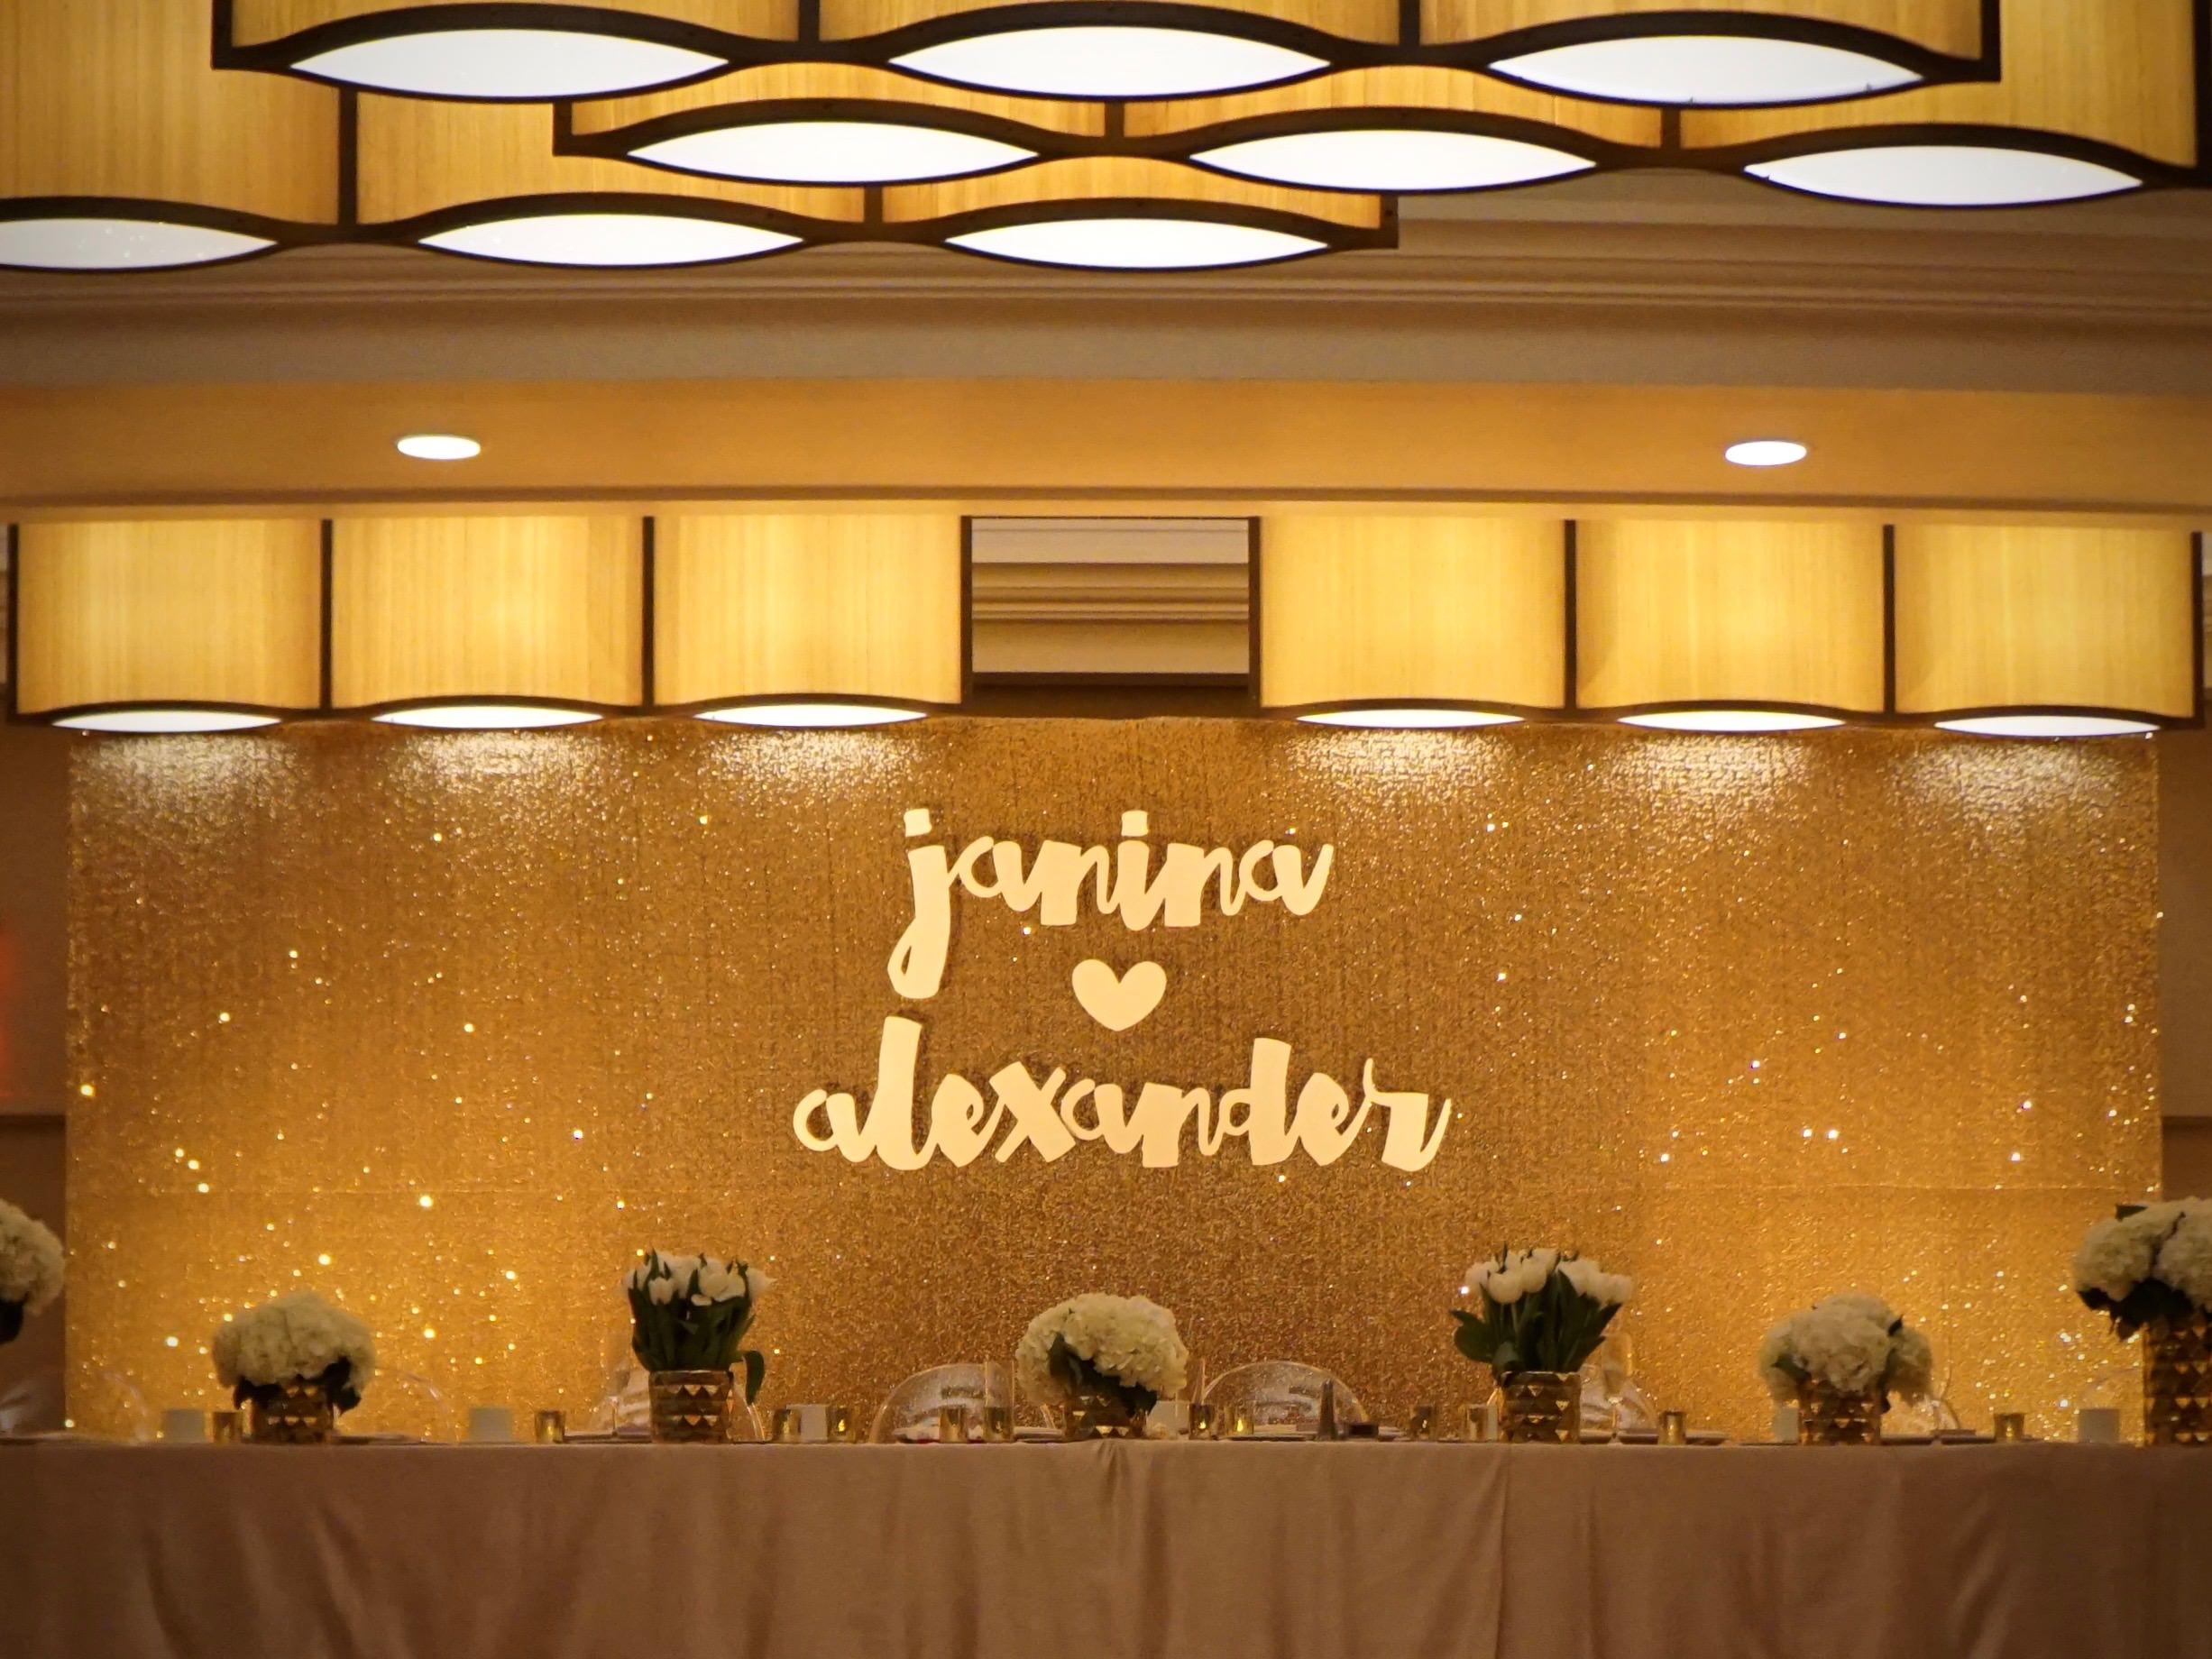 Curate-Wedding-Janina-Al-Kings-Table.jpg